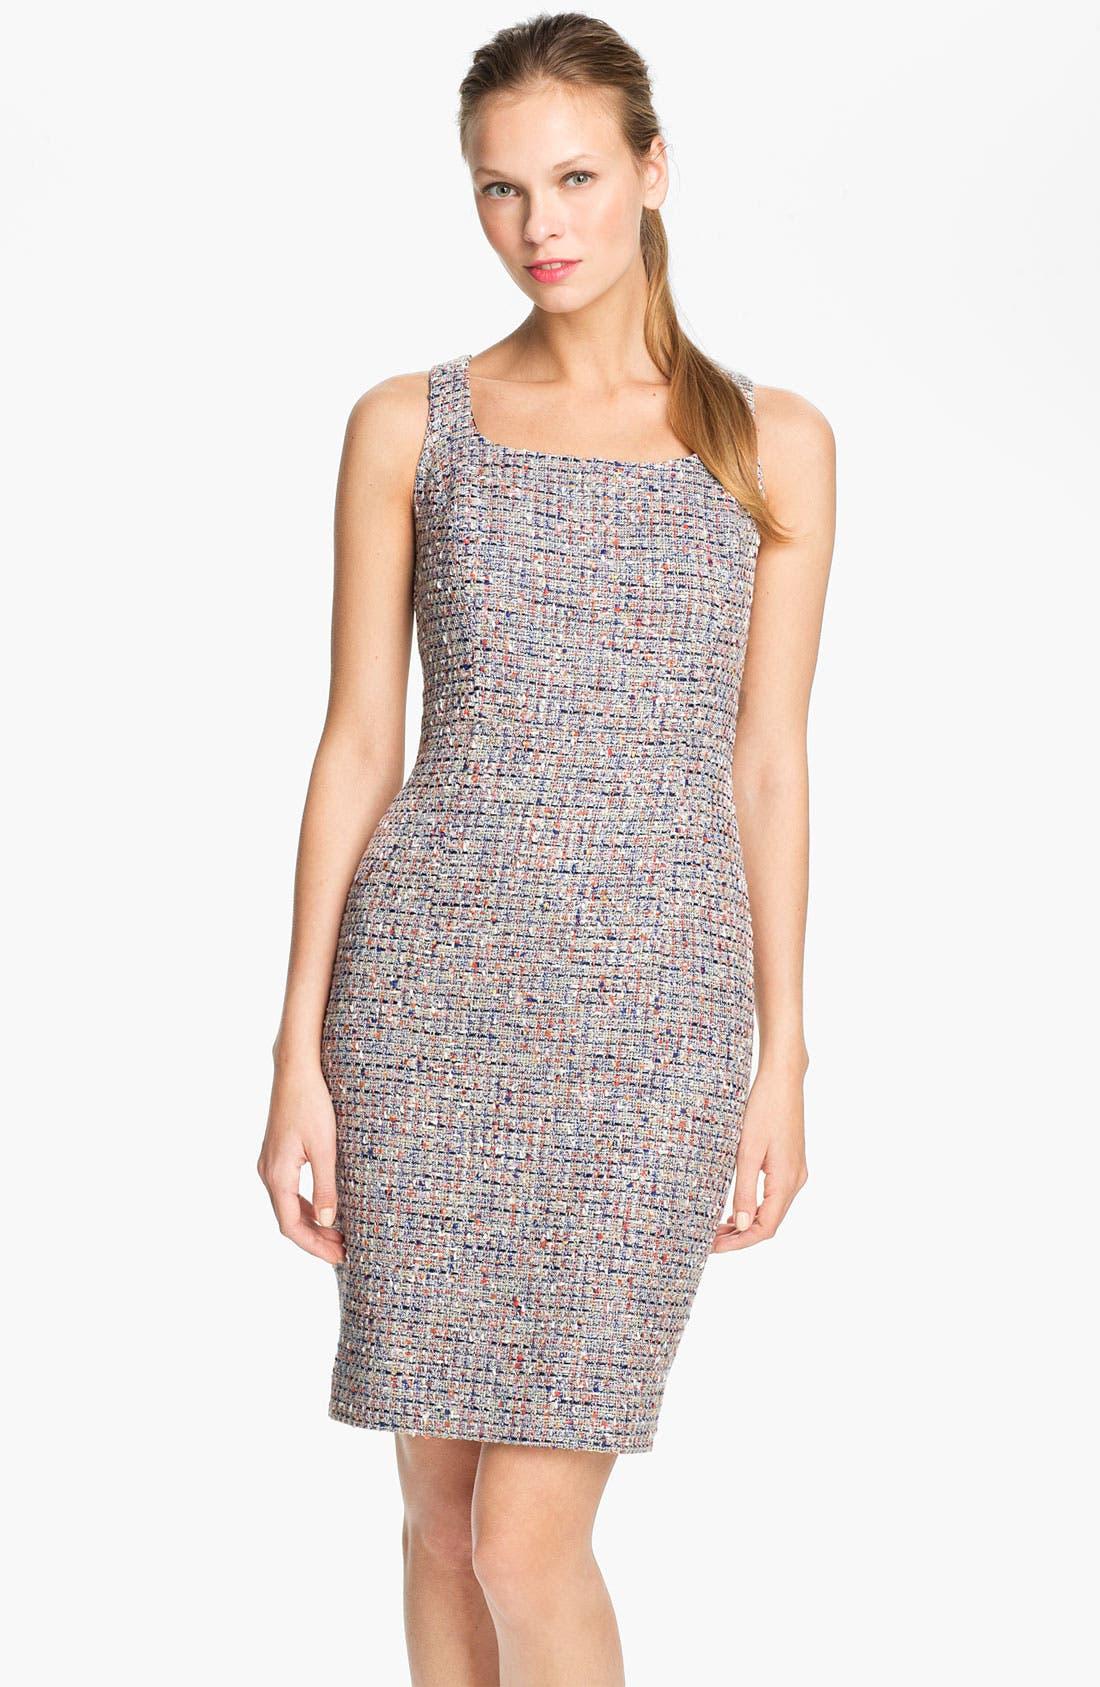 Alternate Image 1 Selected - Tory Burch 'Emma' Tweed Sheath Dress